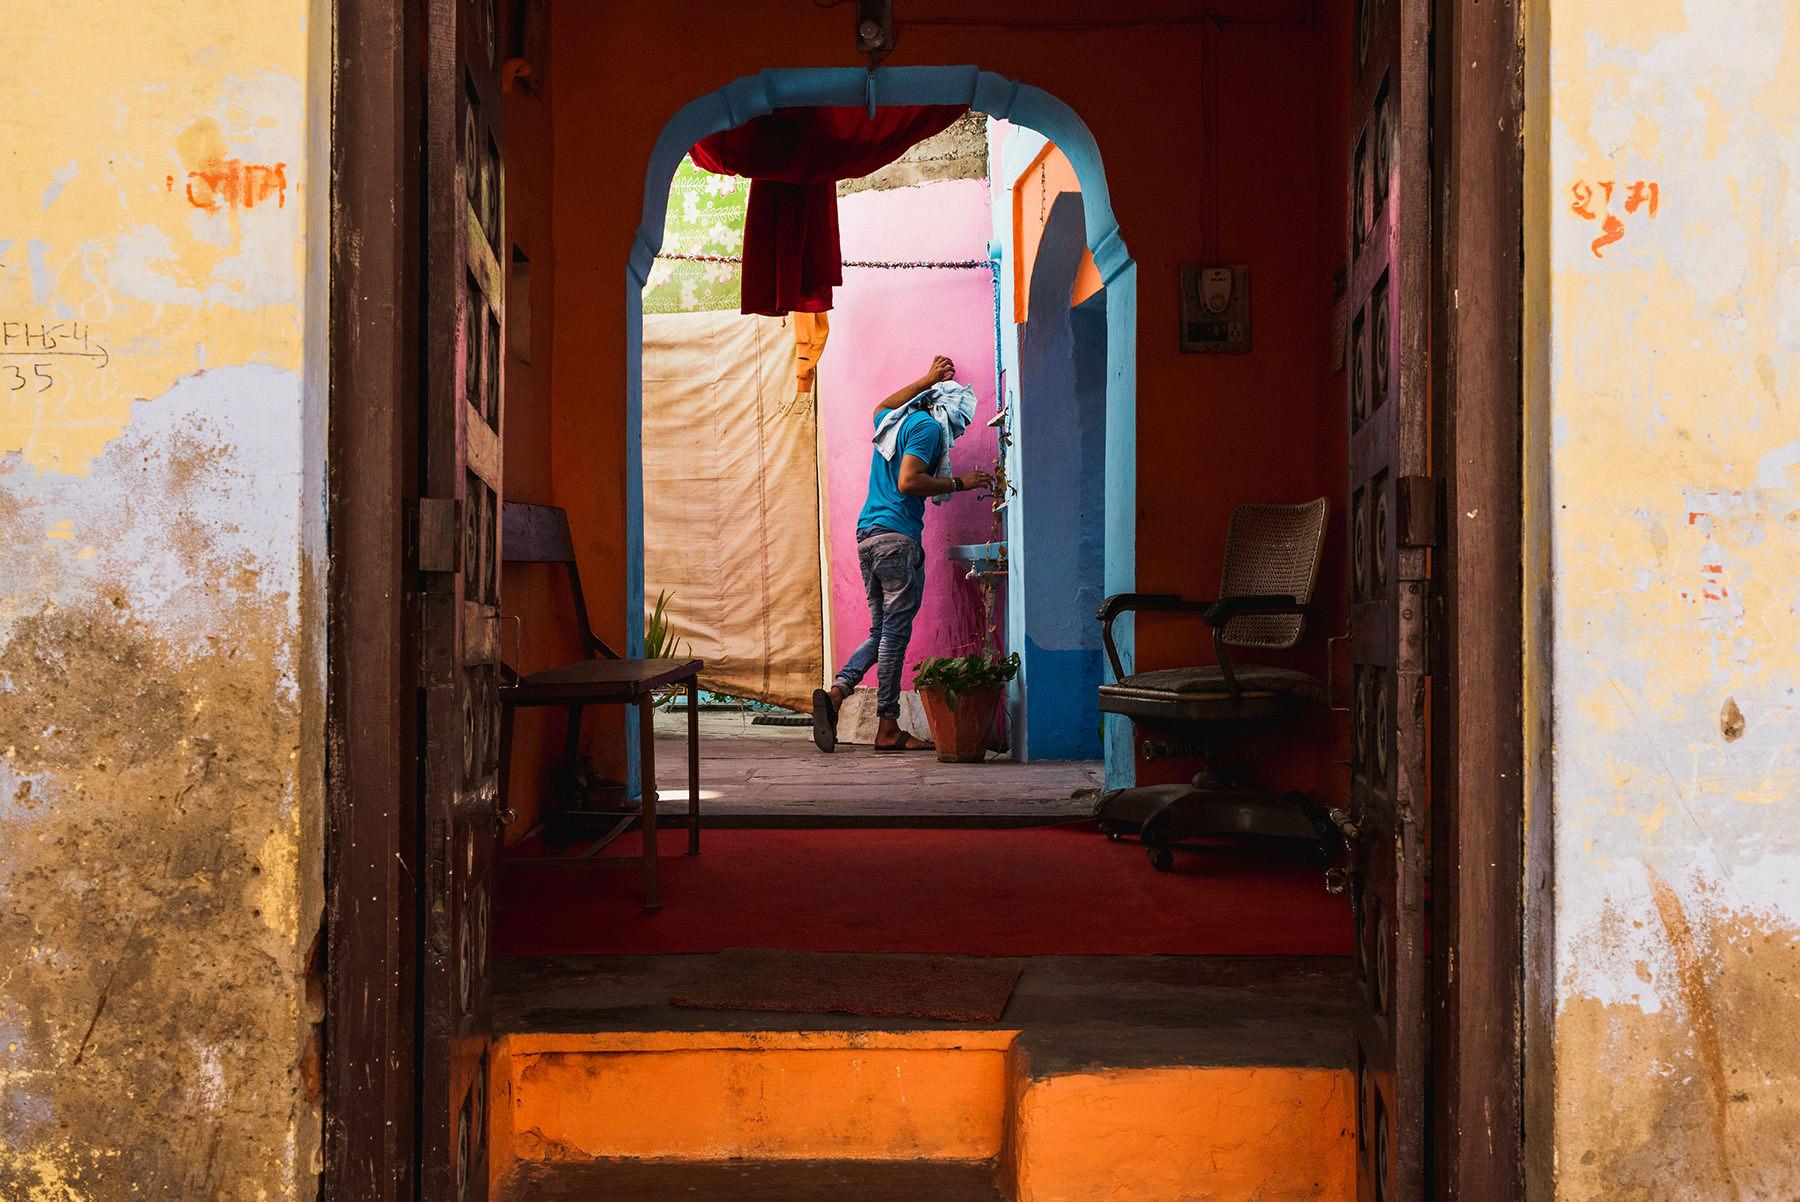 PushkarStreetPhotographer 1